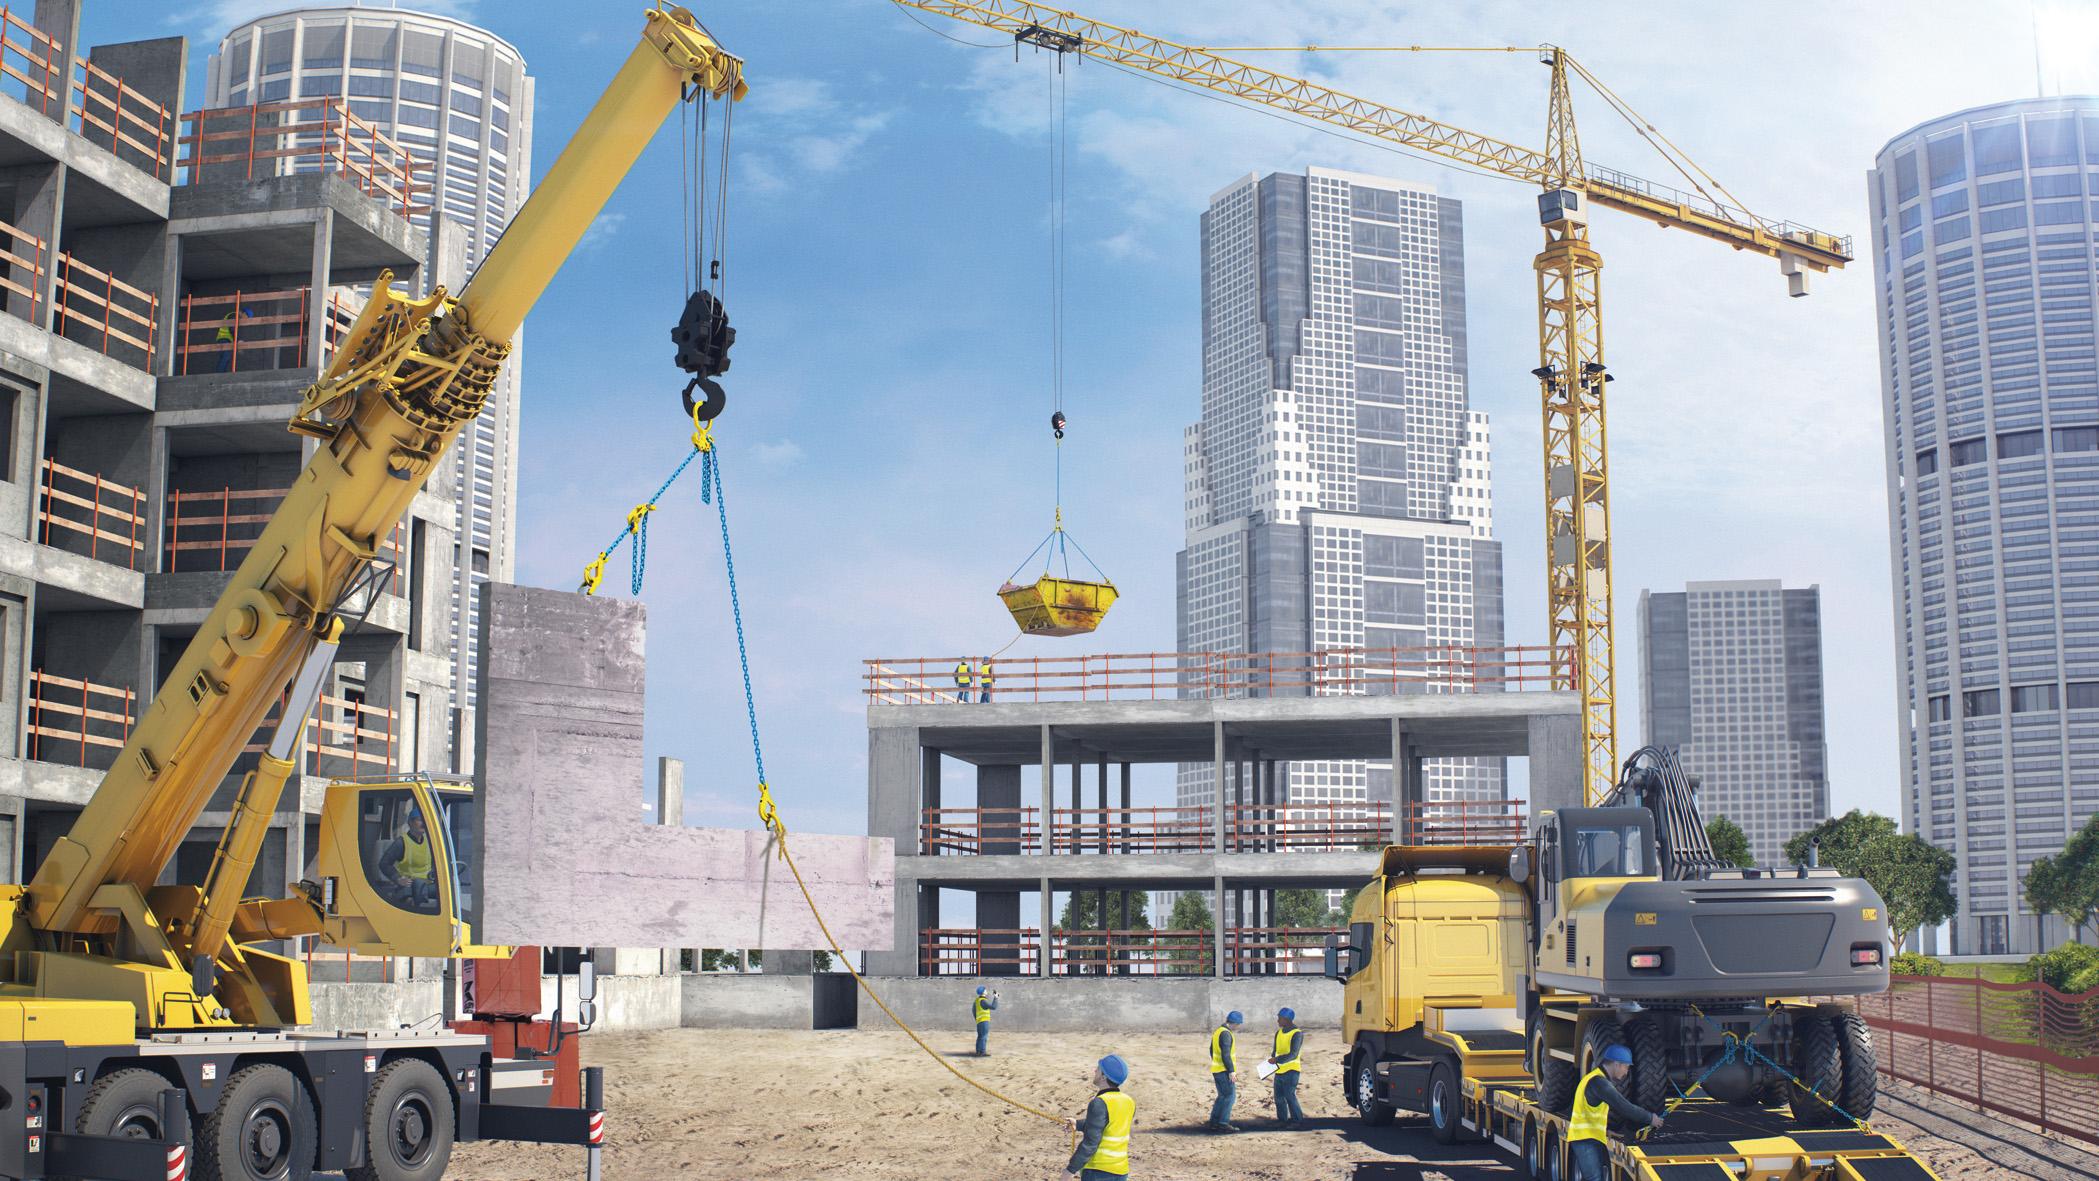 Gunnebo/Construction